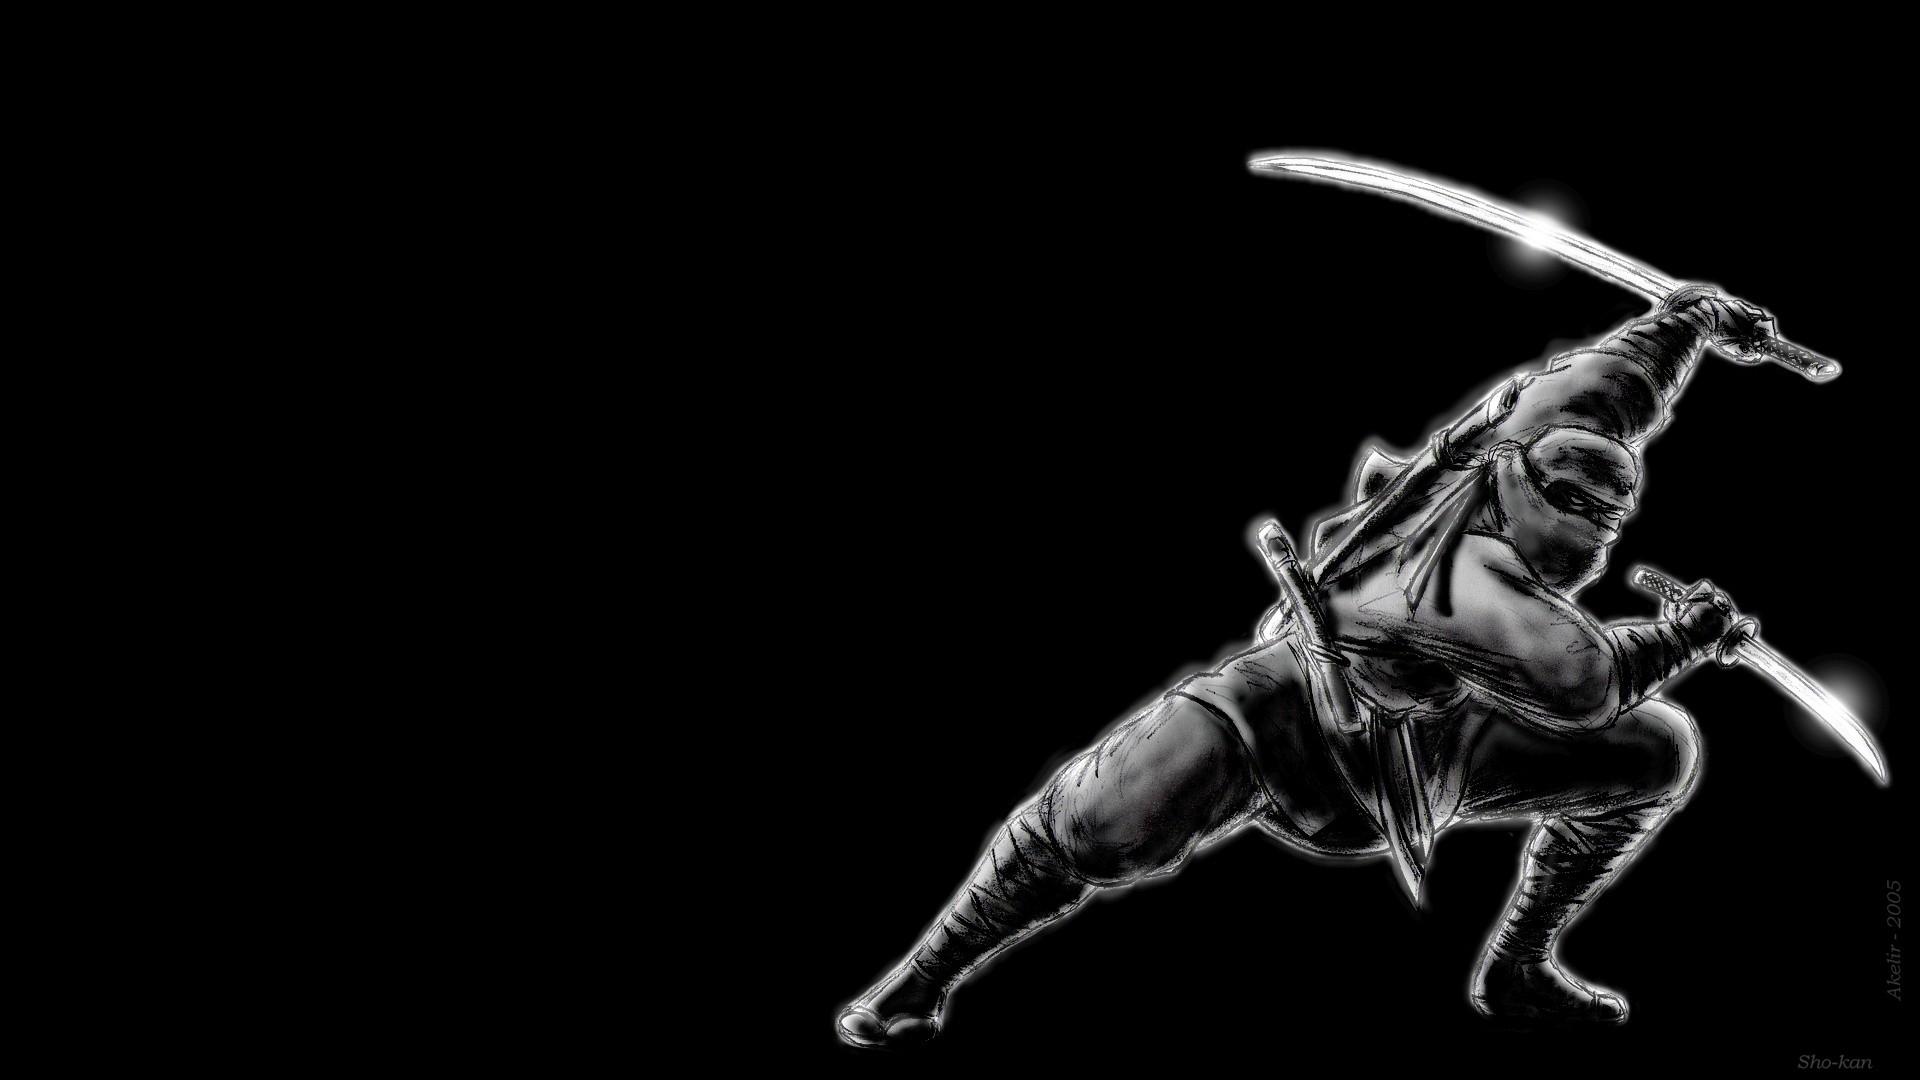 Wallpaper Simple Background Artwork Ninjas Warrior